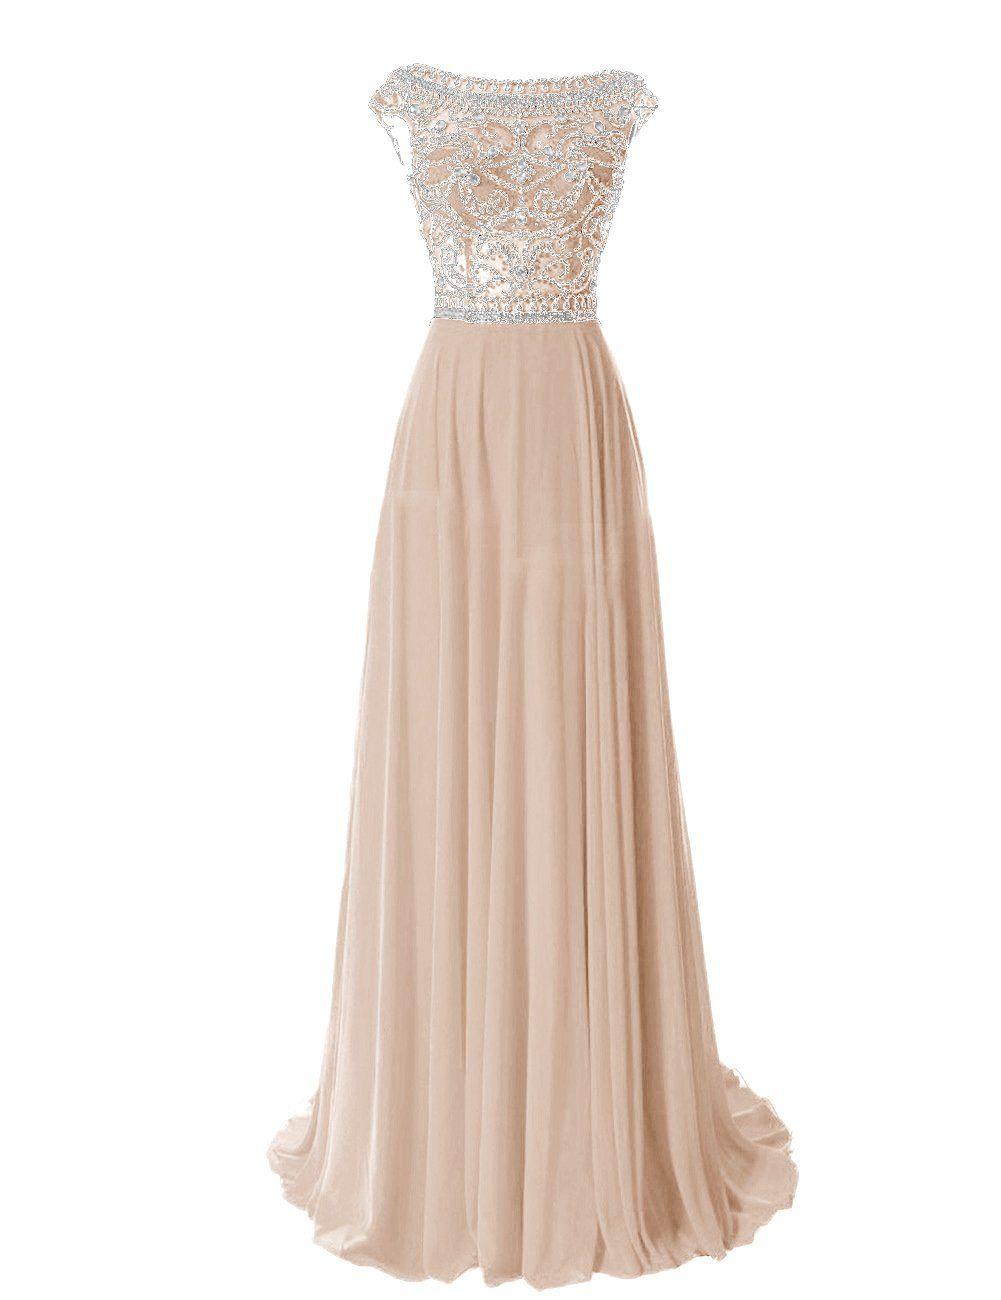 d598141bc83c3 Tidetell Elegant Floor Length Bridesmaid Cap Sleeve Prom Evening Dresses  Navy Size 4